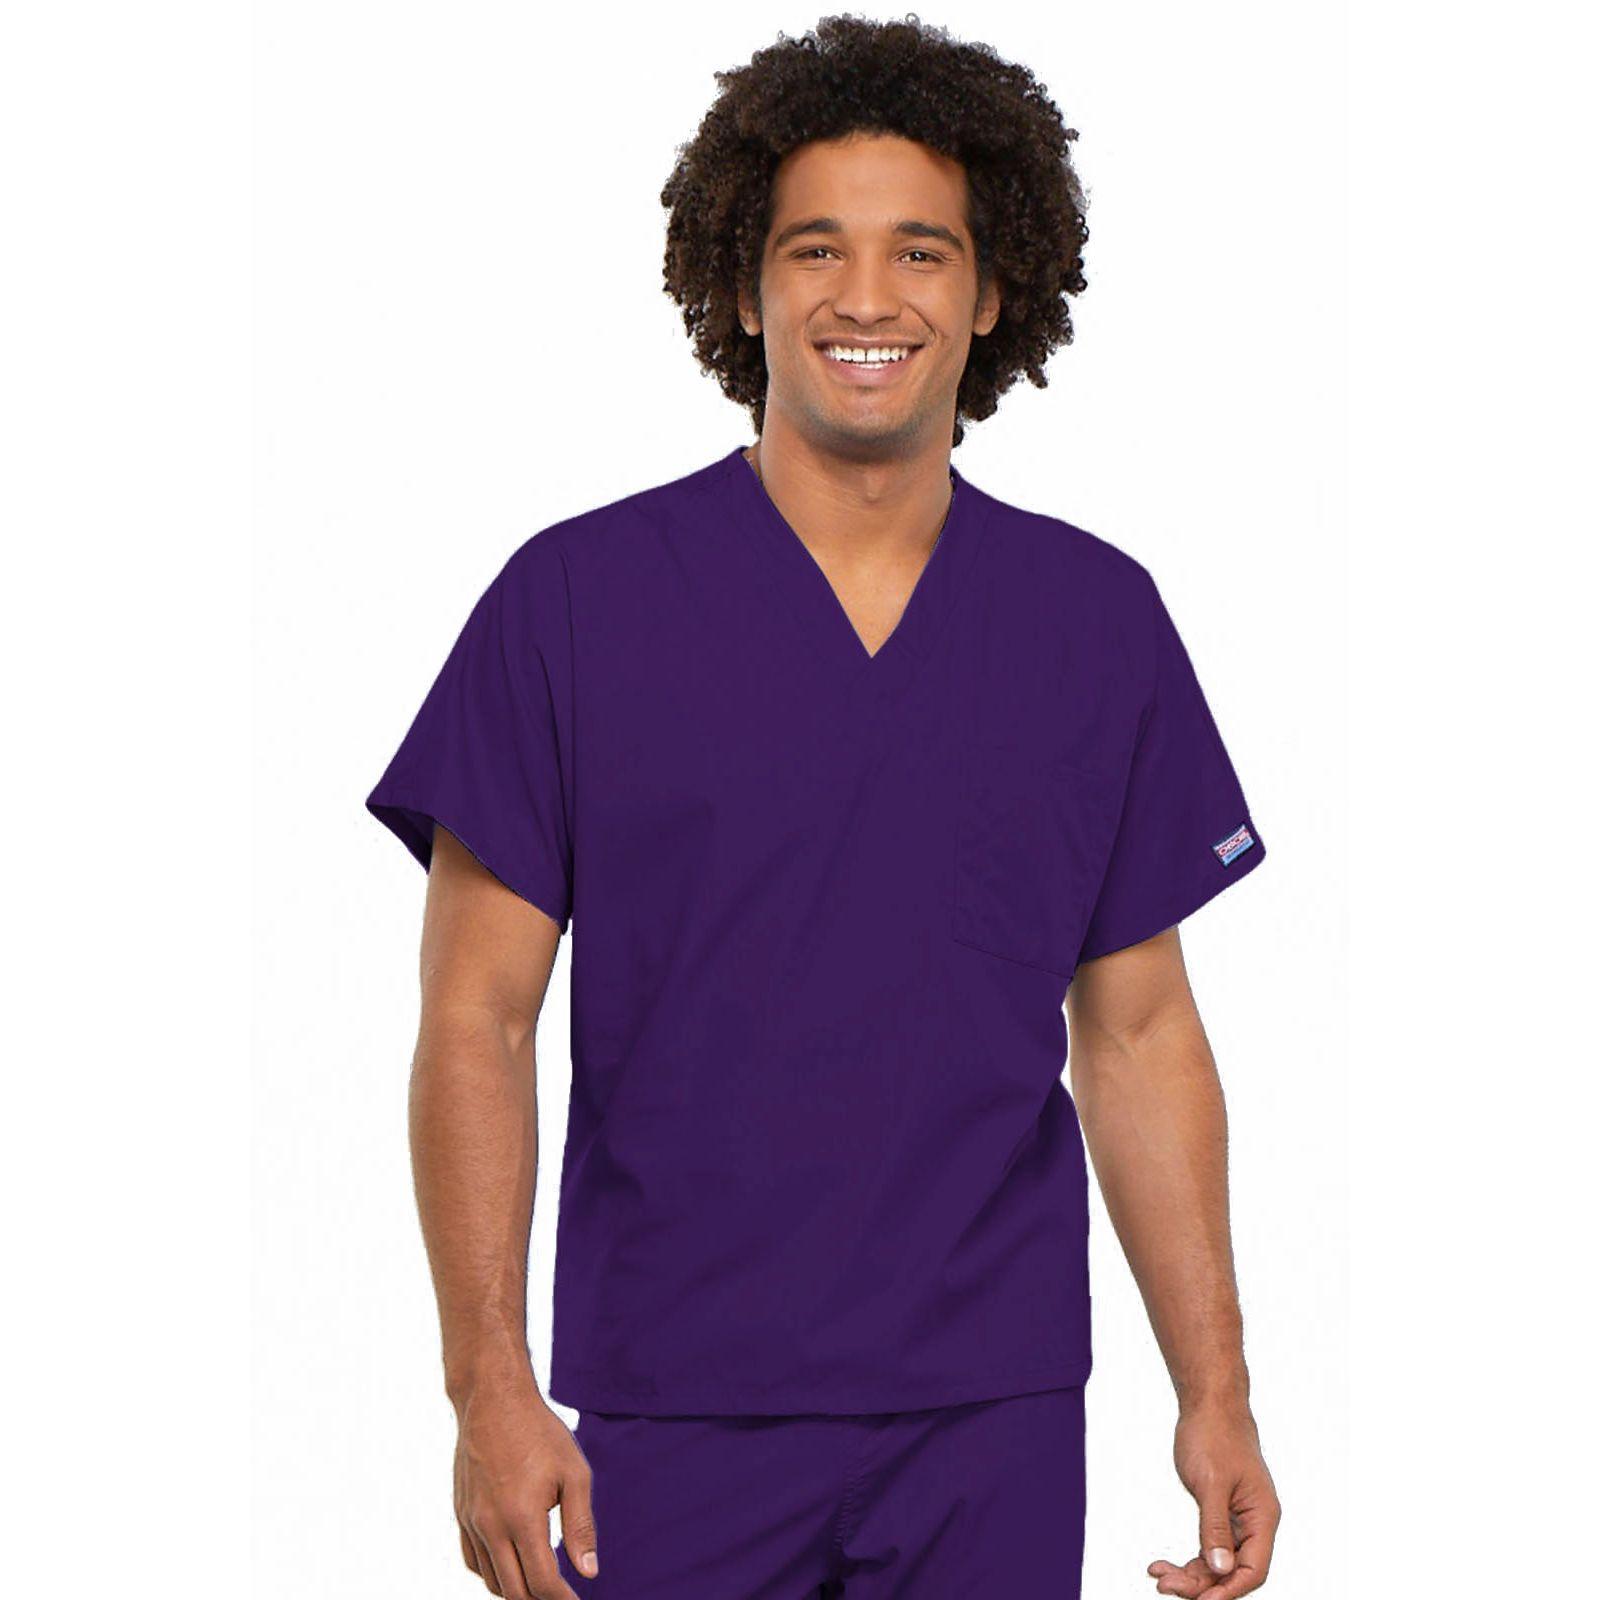 Blouse médicale Homme, Cherokee Workwear Originals (4777) aubergine face